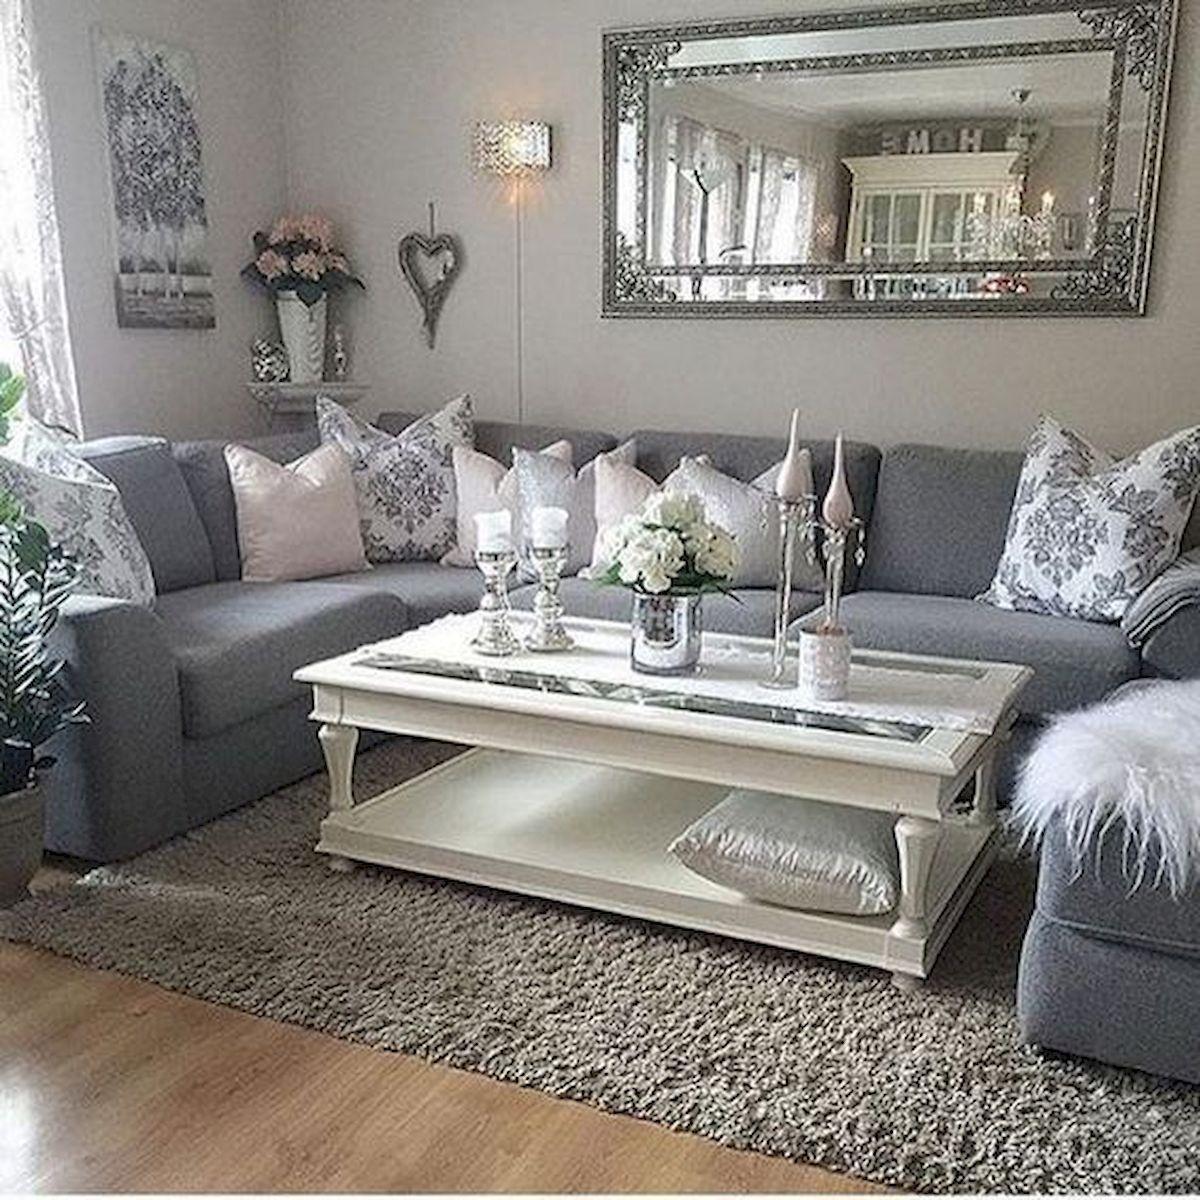 Grey Glam Living Room Ideas: 75 Best Farmhouse Wall Decor Ideas For Living Room (1